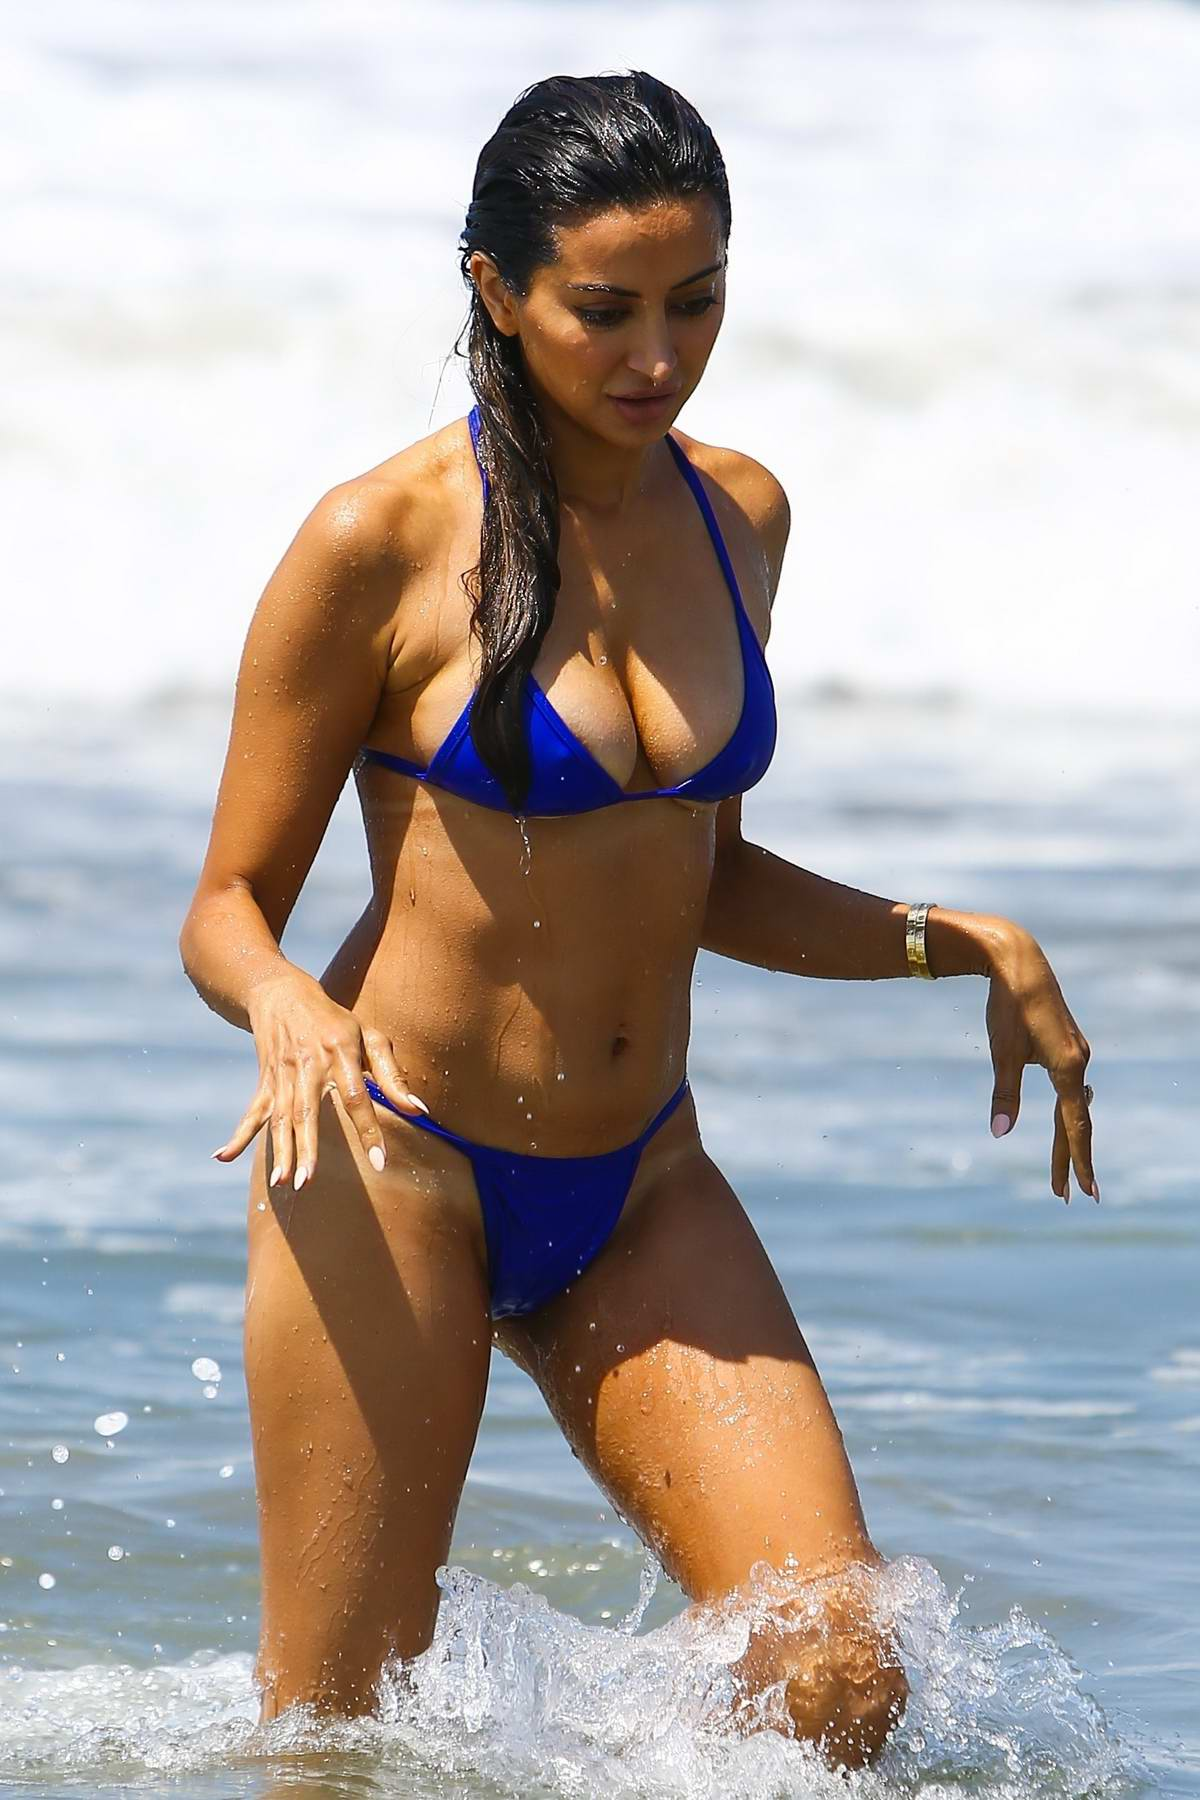 Noureen DeWulf in a Blue Bikini enjoying the Ocean in Santa Monica, California